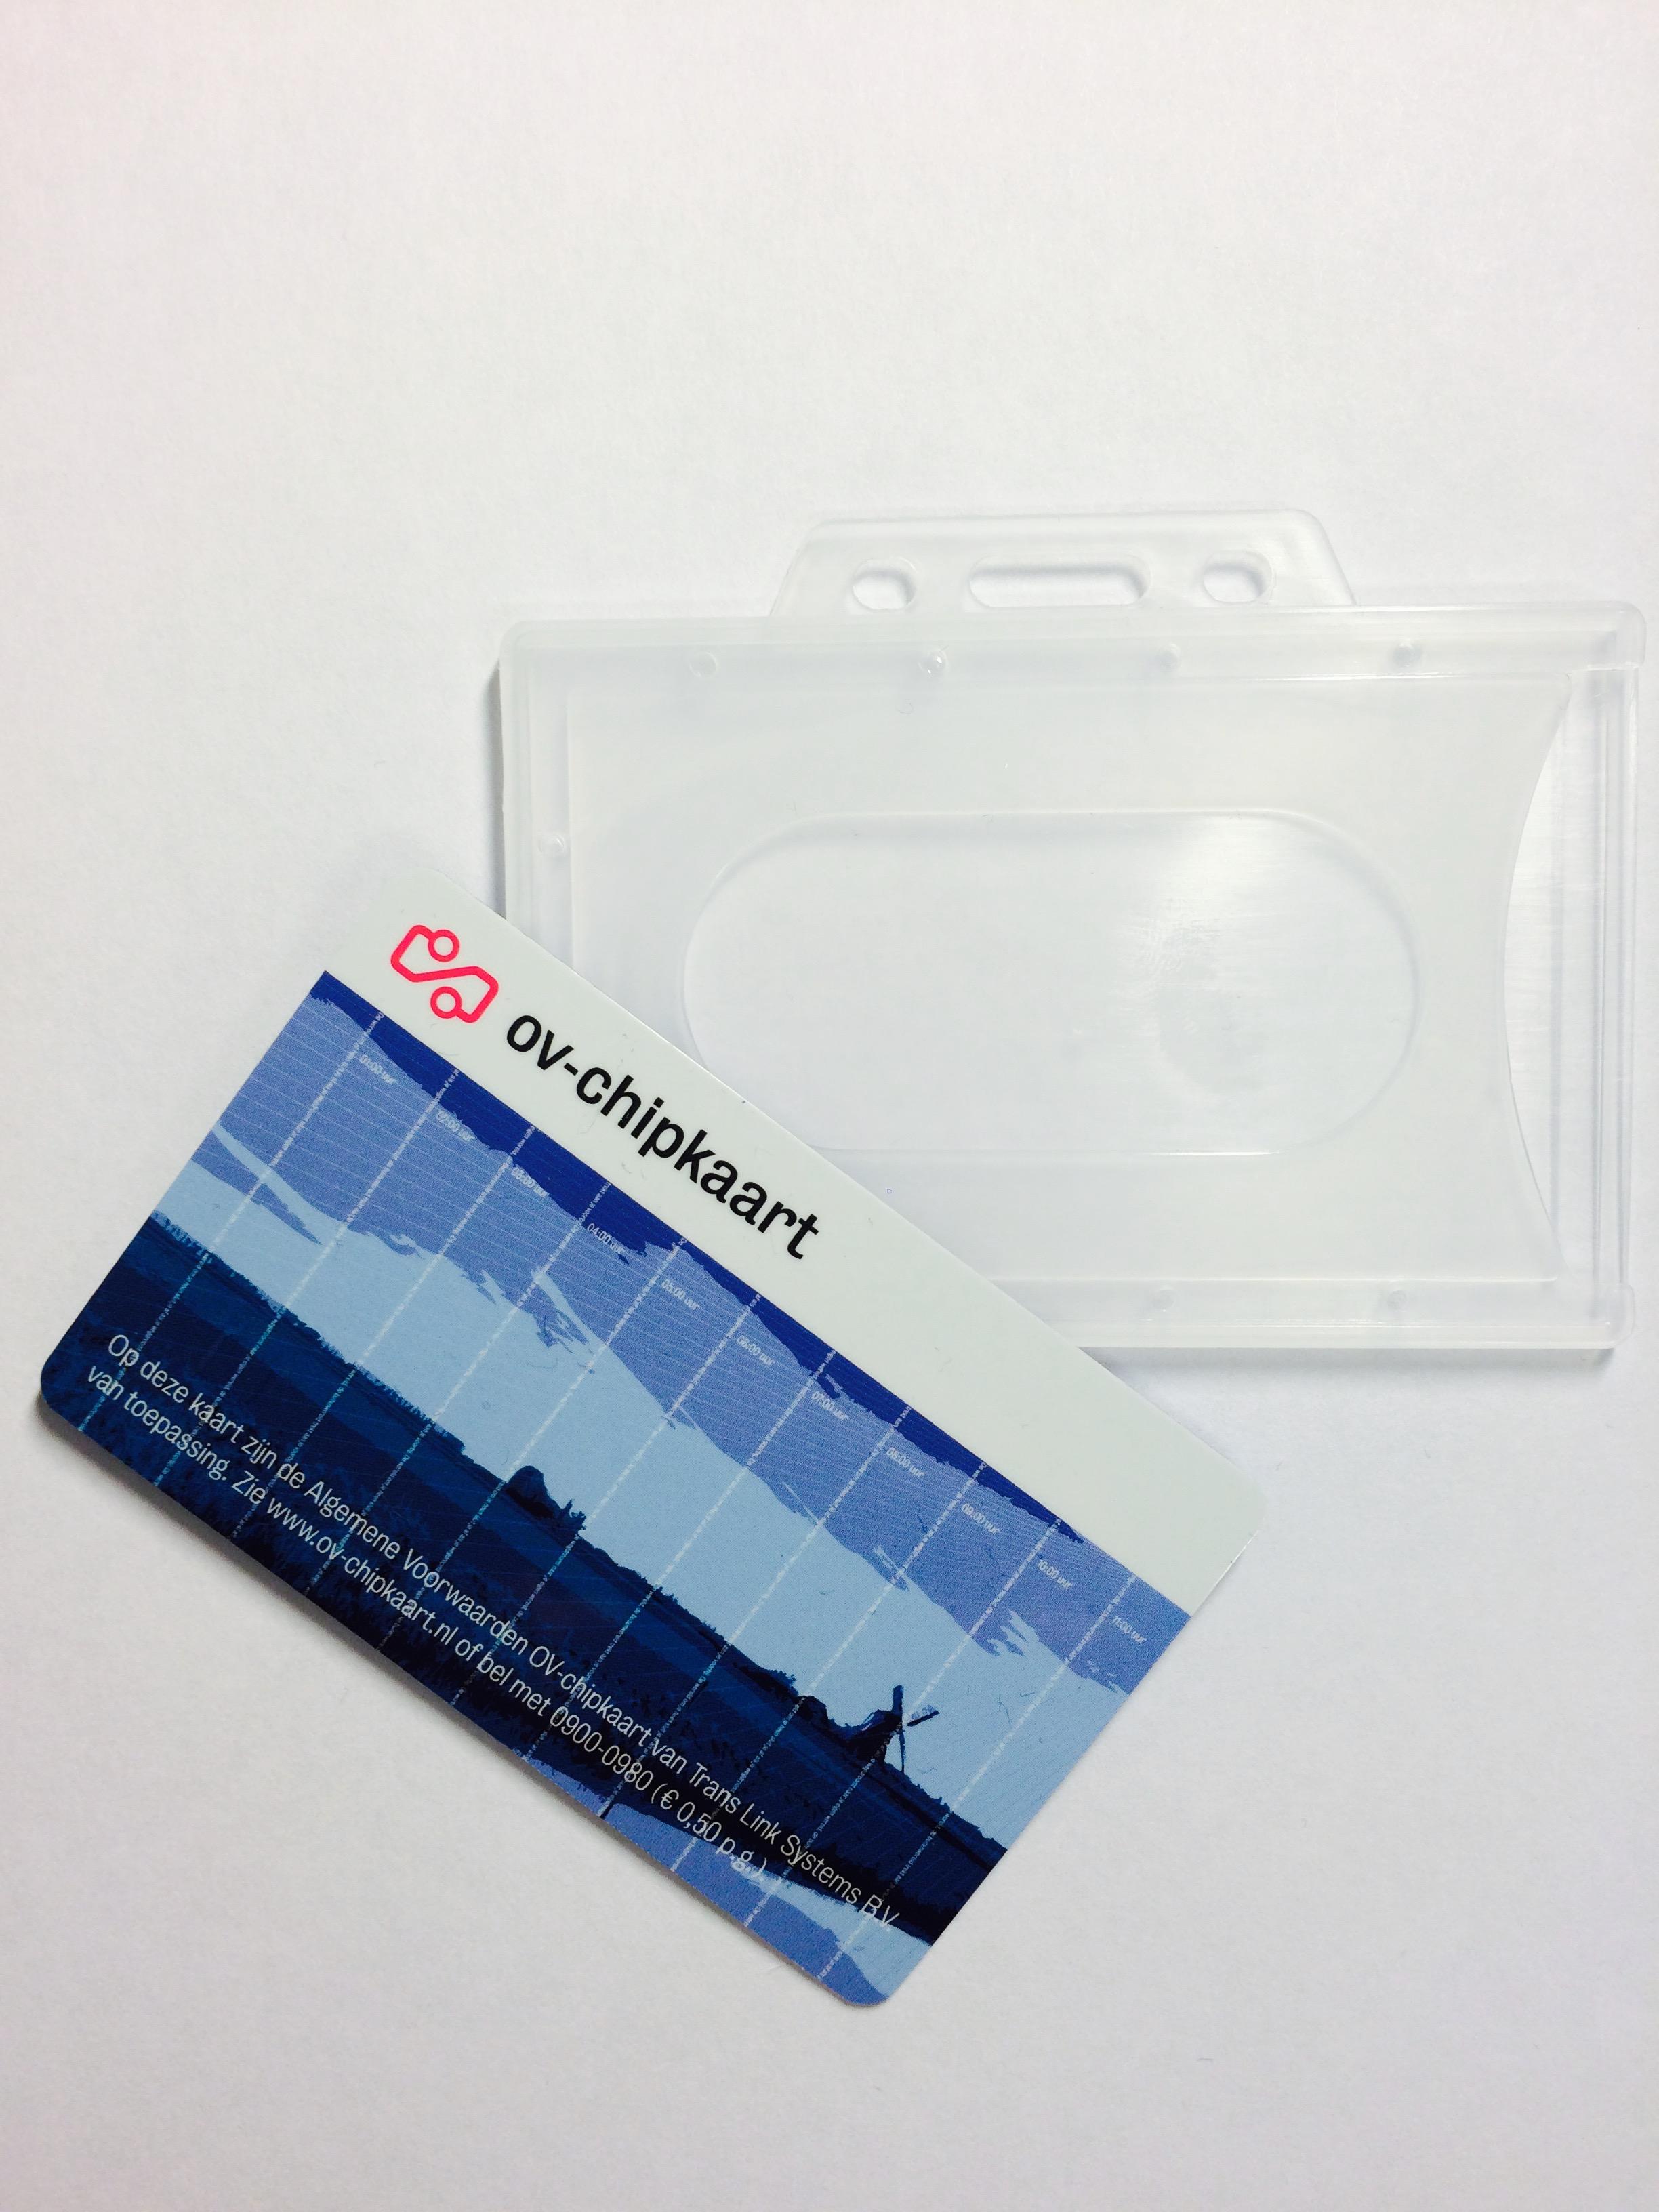 30a594f23d5 OV-chipkaart hoesje transparant - OV Accessoires - OV-chipkaart kopen